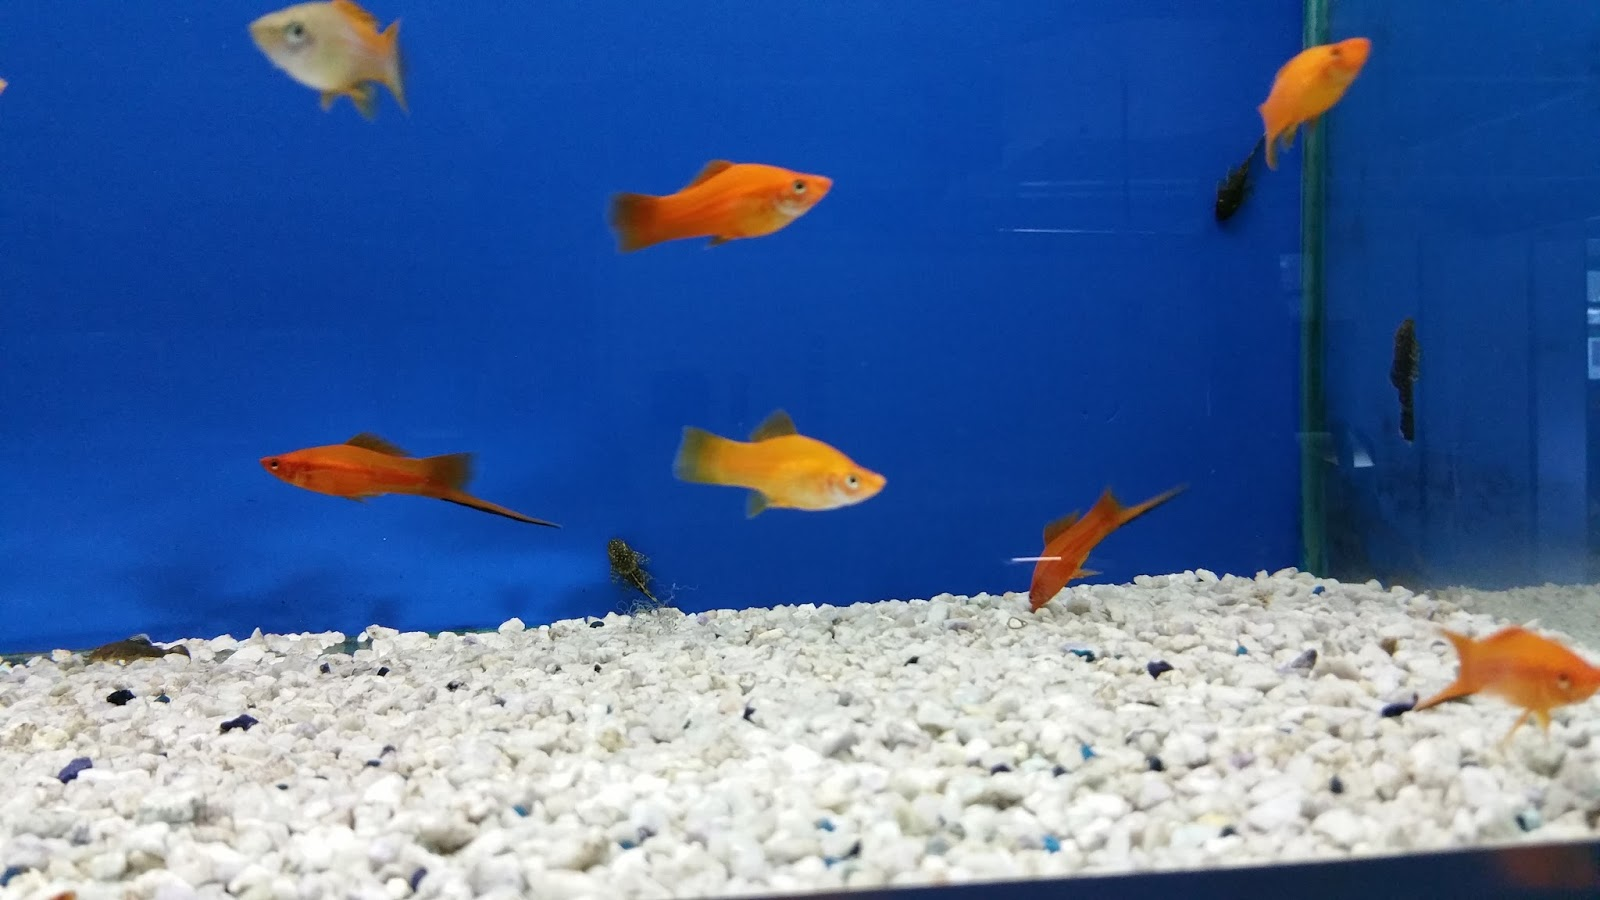 Pirana aquarium pesci tropicali d 39 acqua dolce gli for Pesci acqua dolce